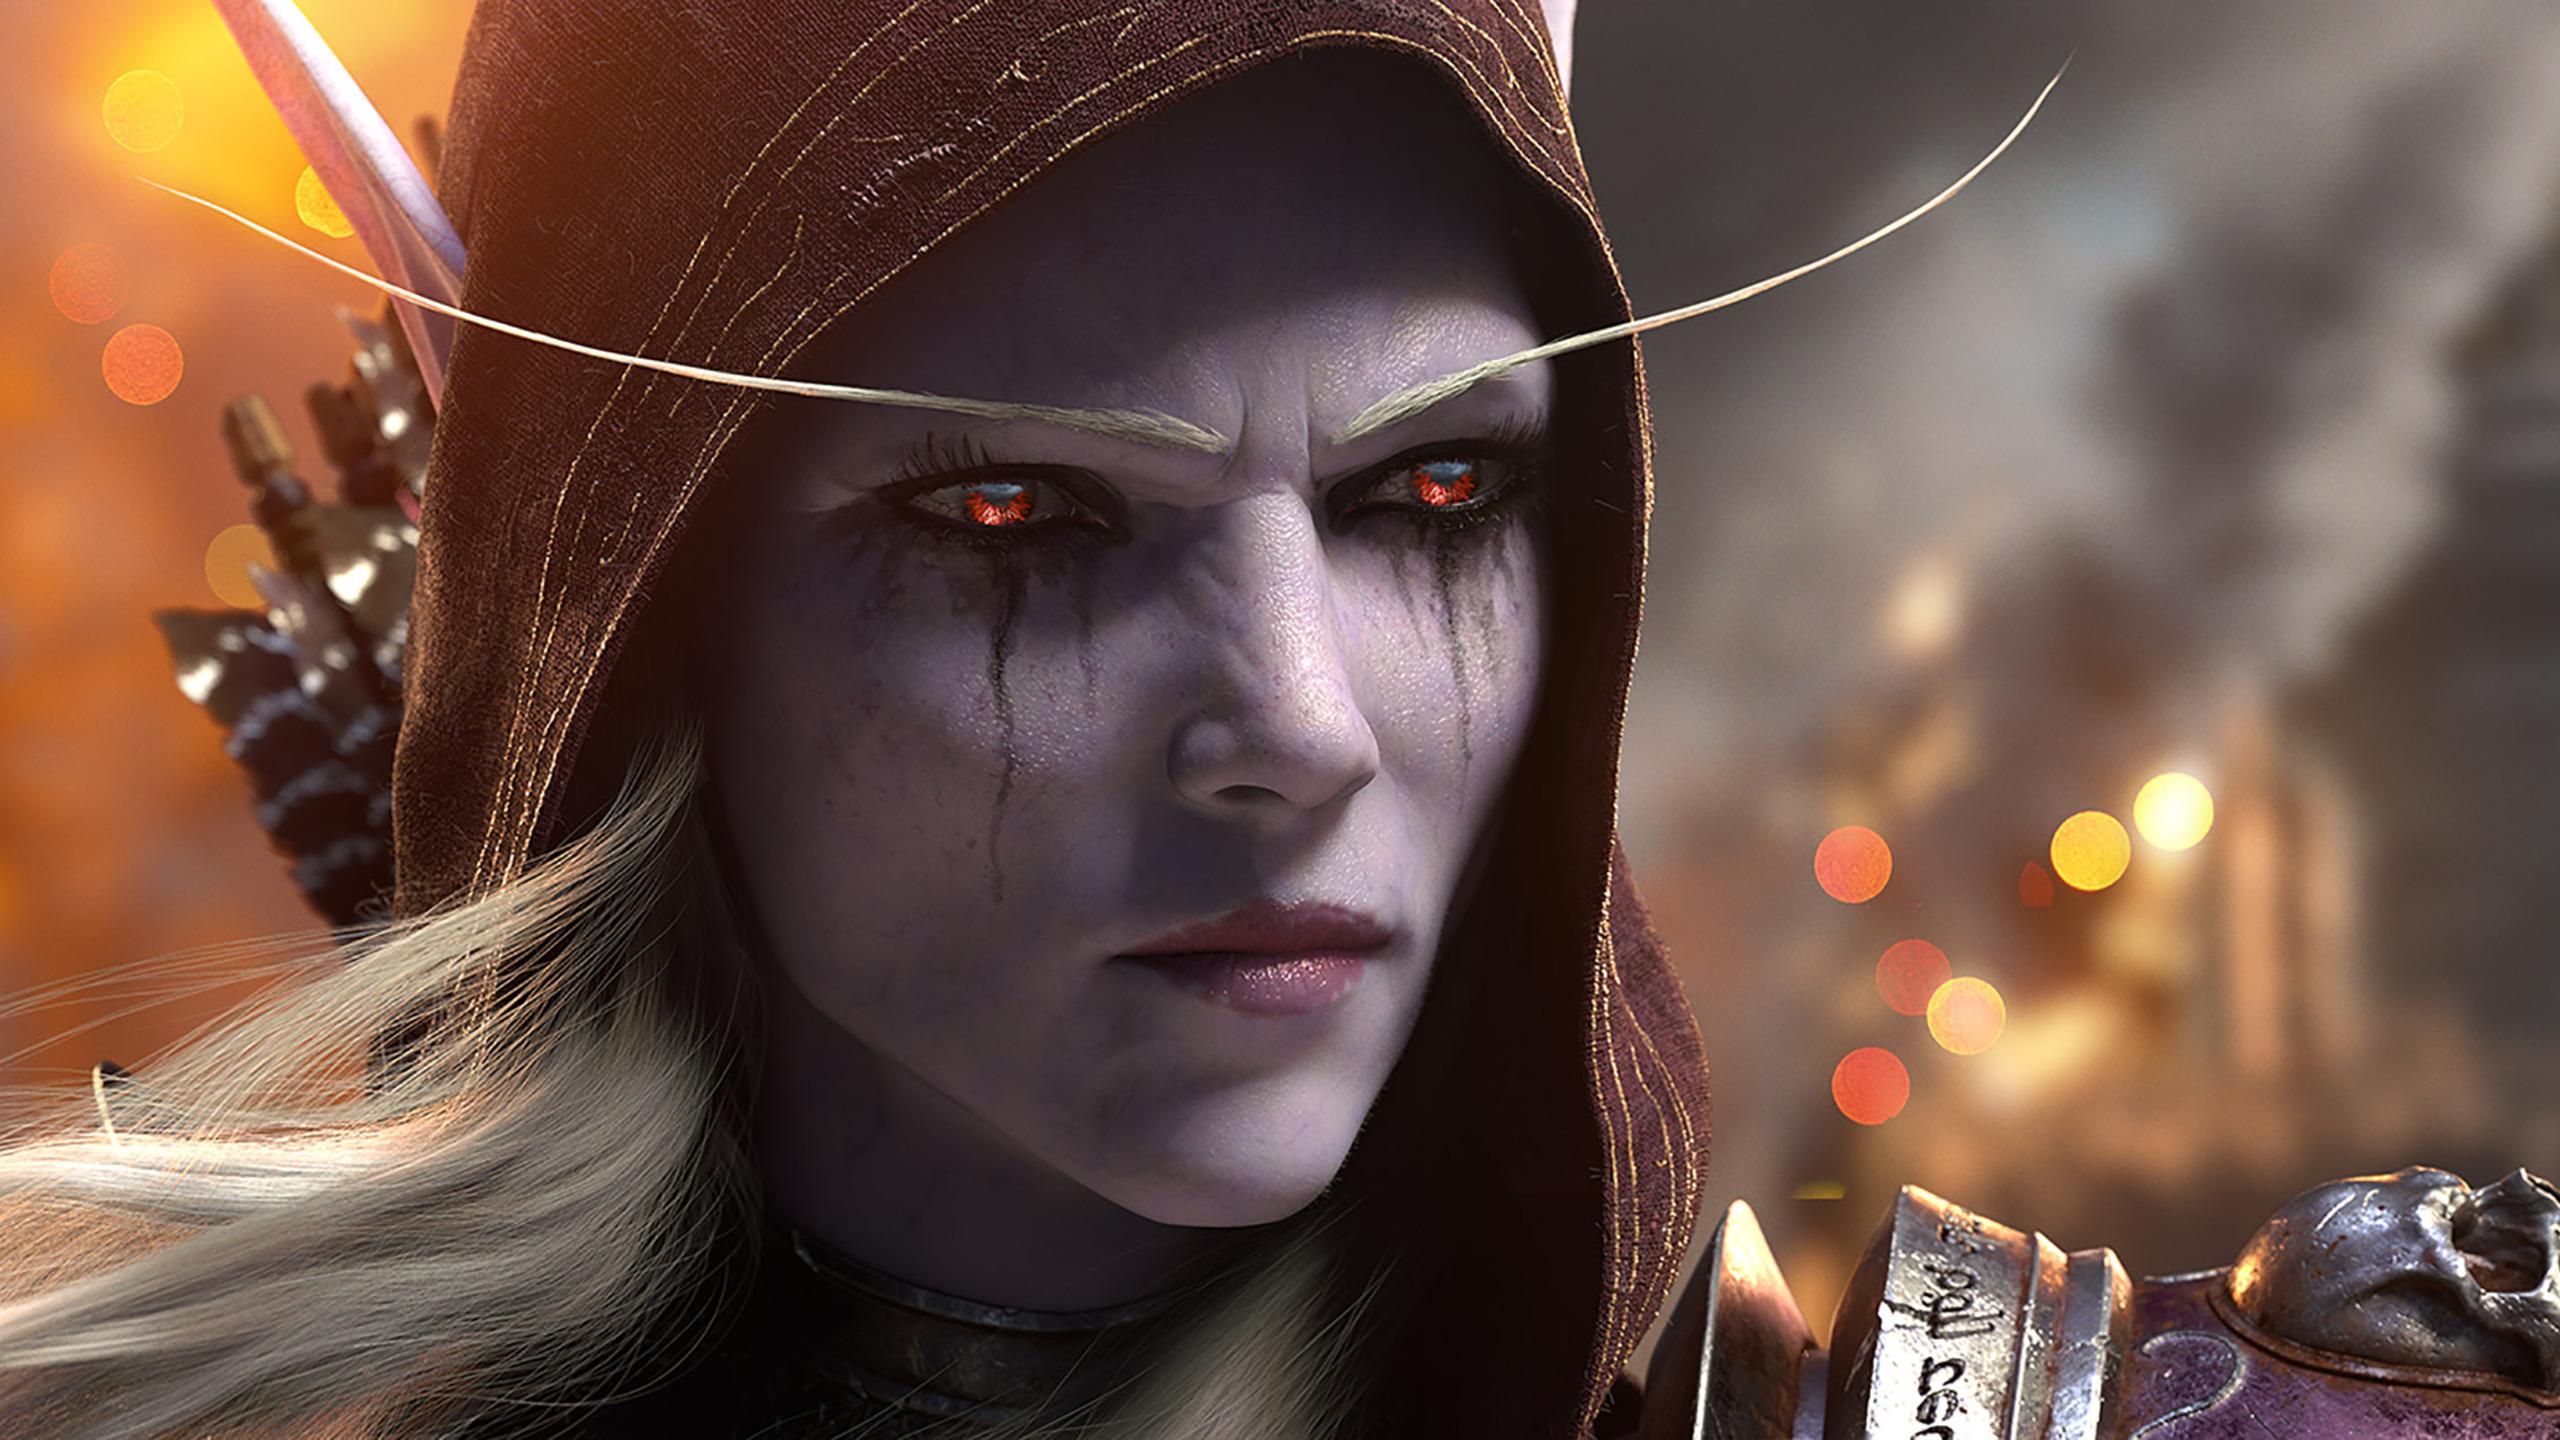 2560x1440 World Of Warcraft Darlady 1440p Resolution Hd 4k